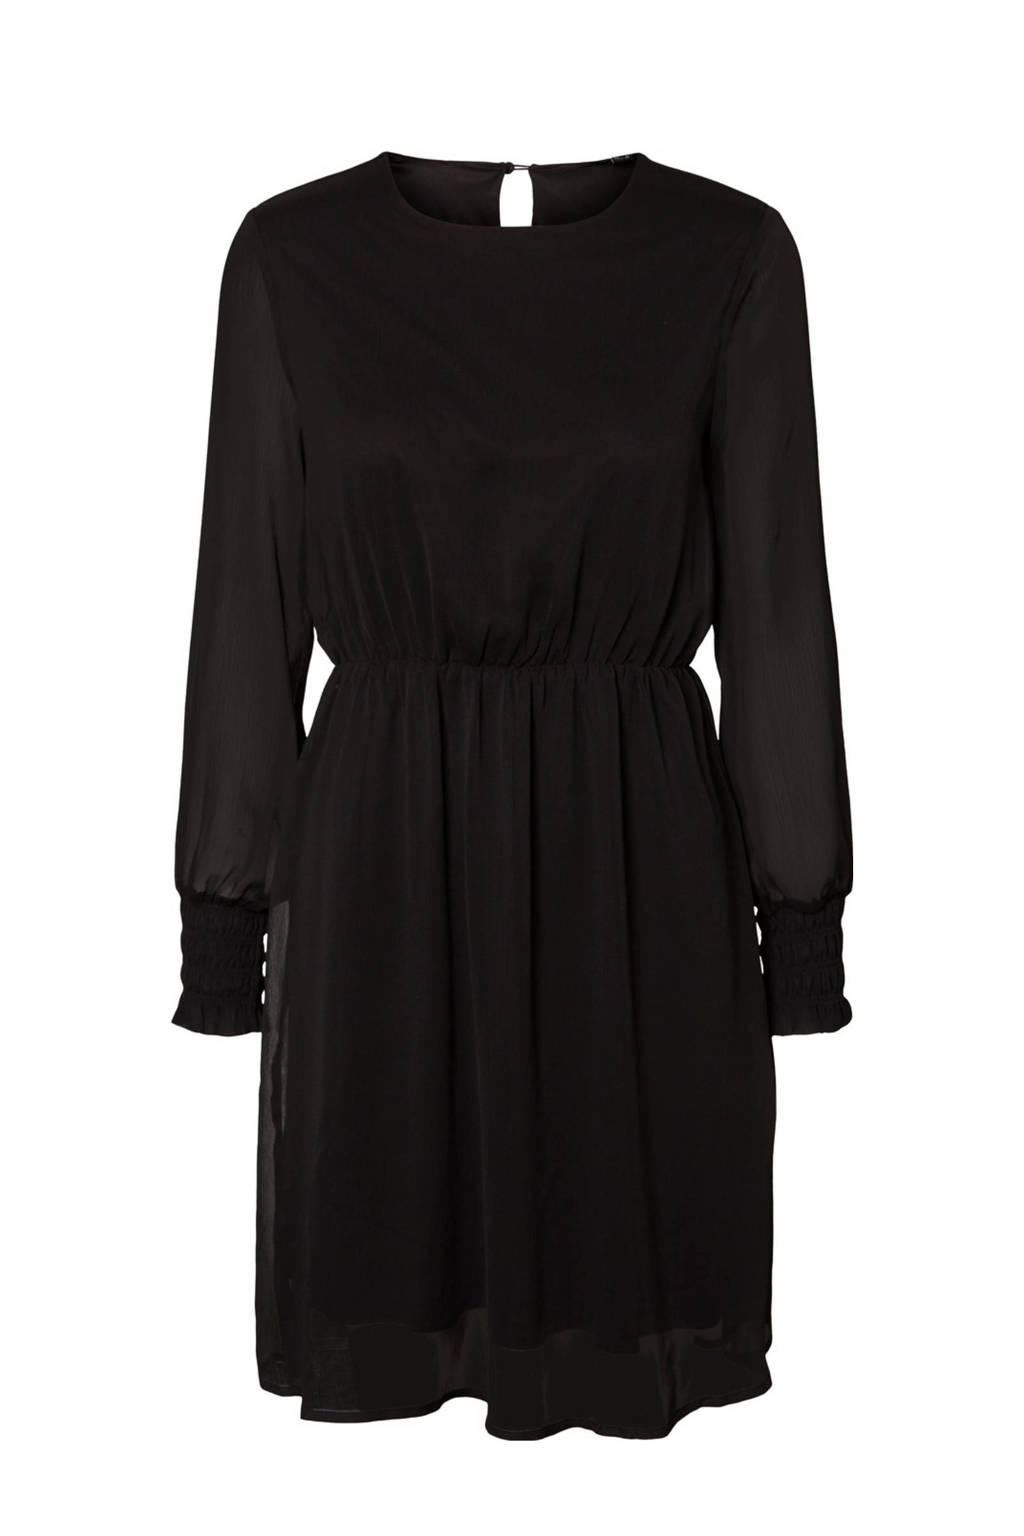 VERO MODA blousejurk zwart, Zwart